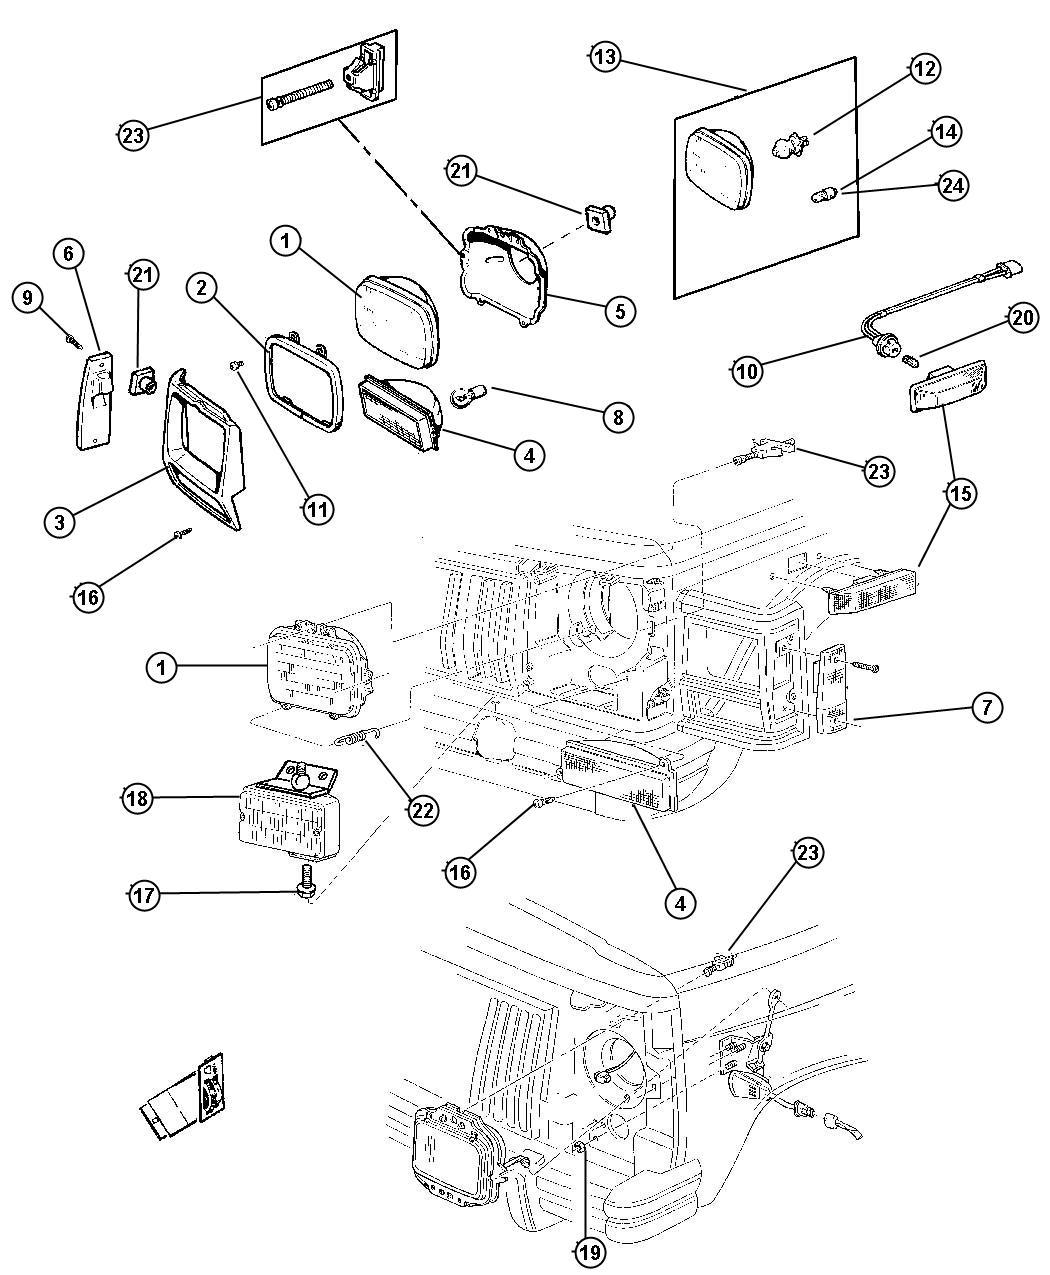 2001 Jeep Cherokee Module. Headlamp delay. Relay, headlamp